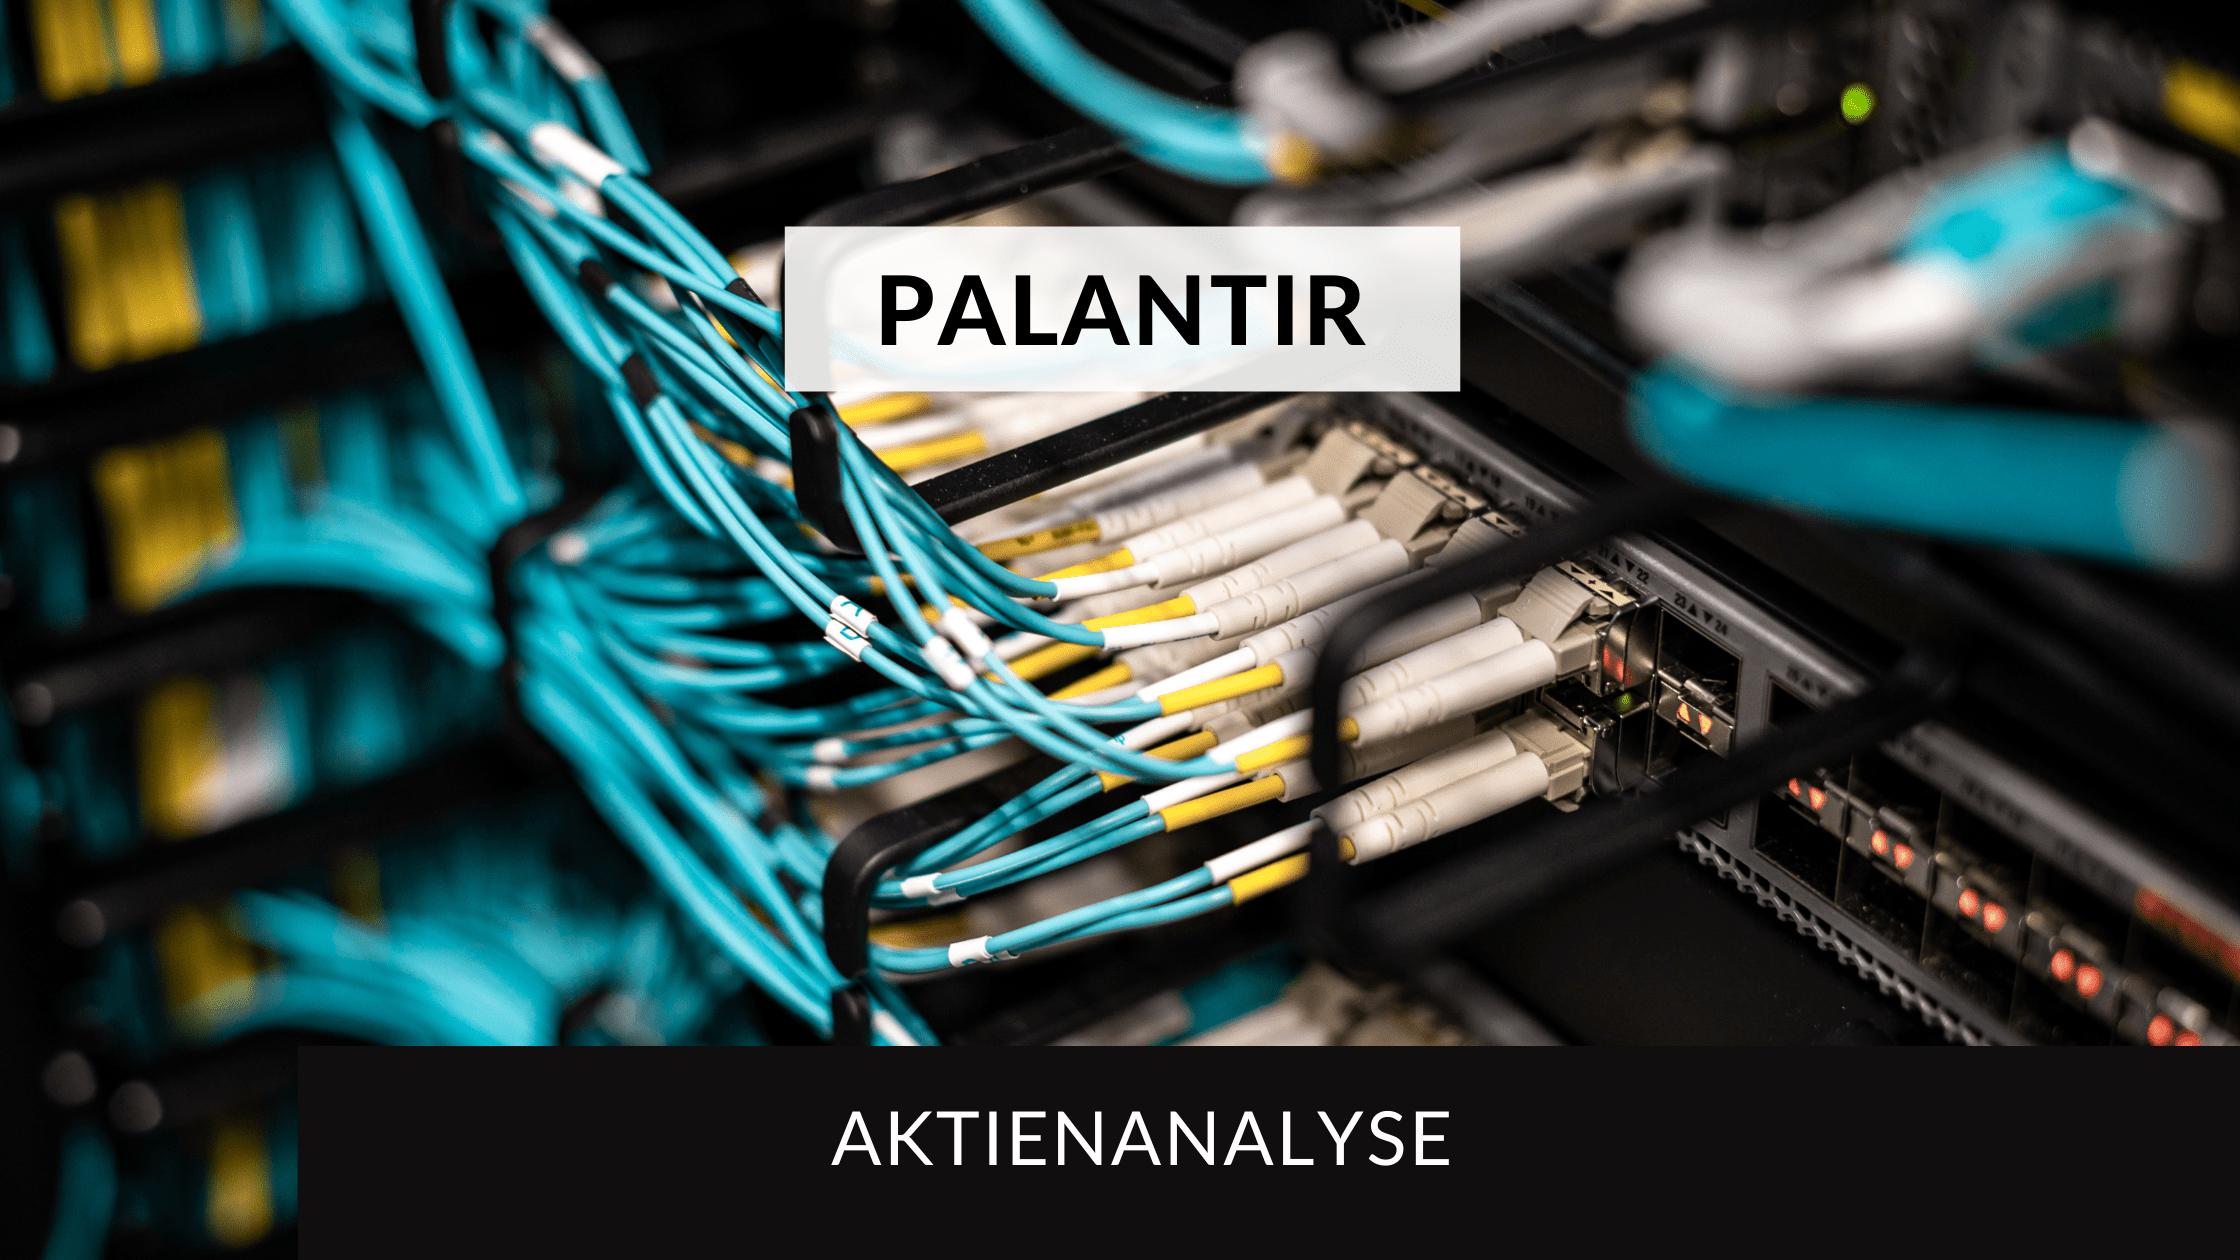 Palantir Technologies Aktienanalyse